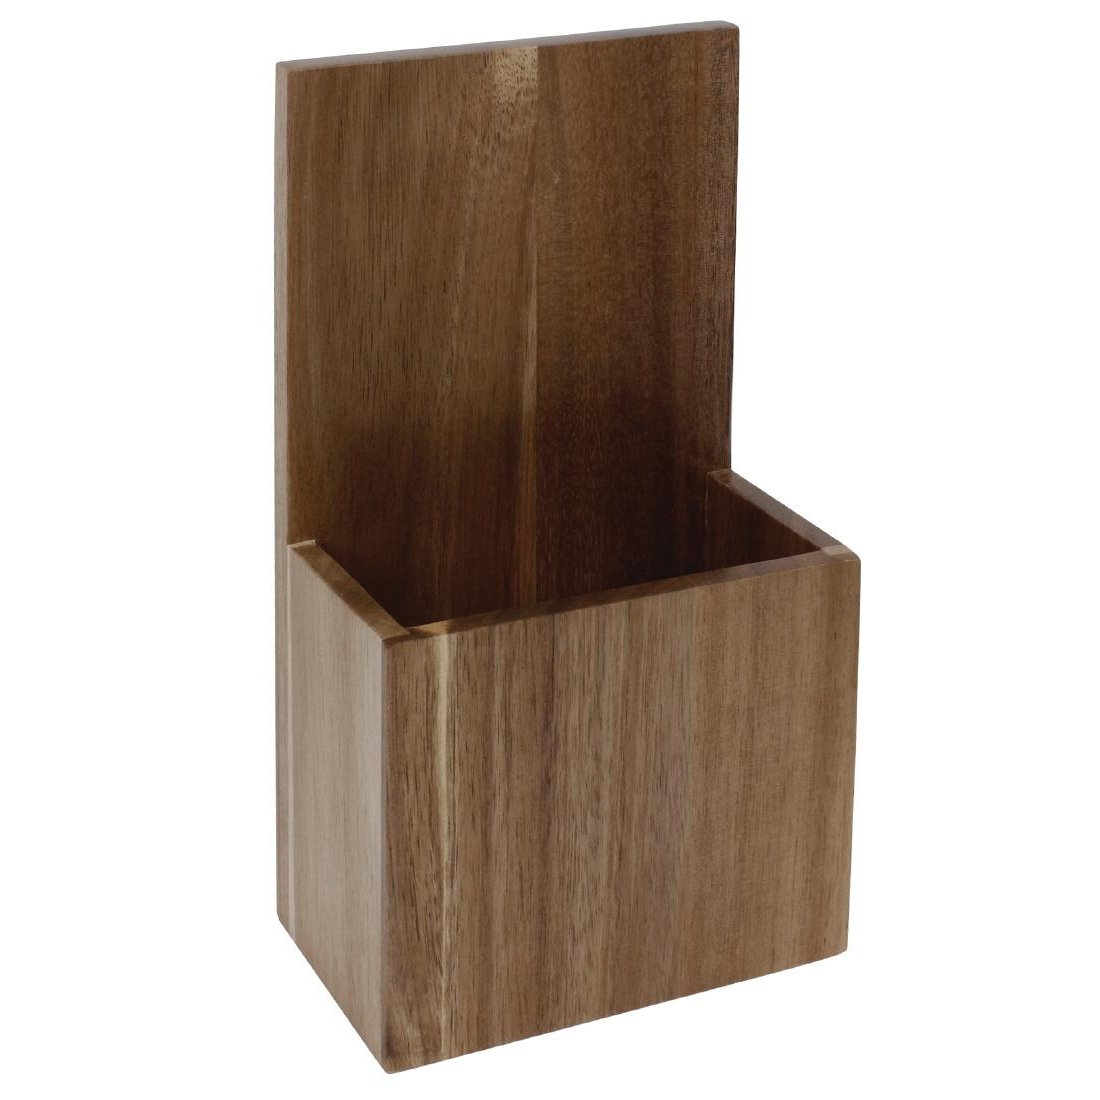 Porte-menus en bois Olympia 125x75x235mm